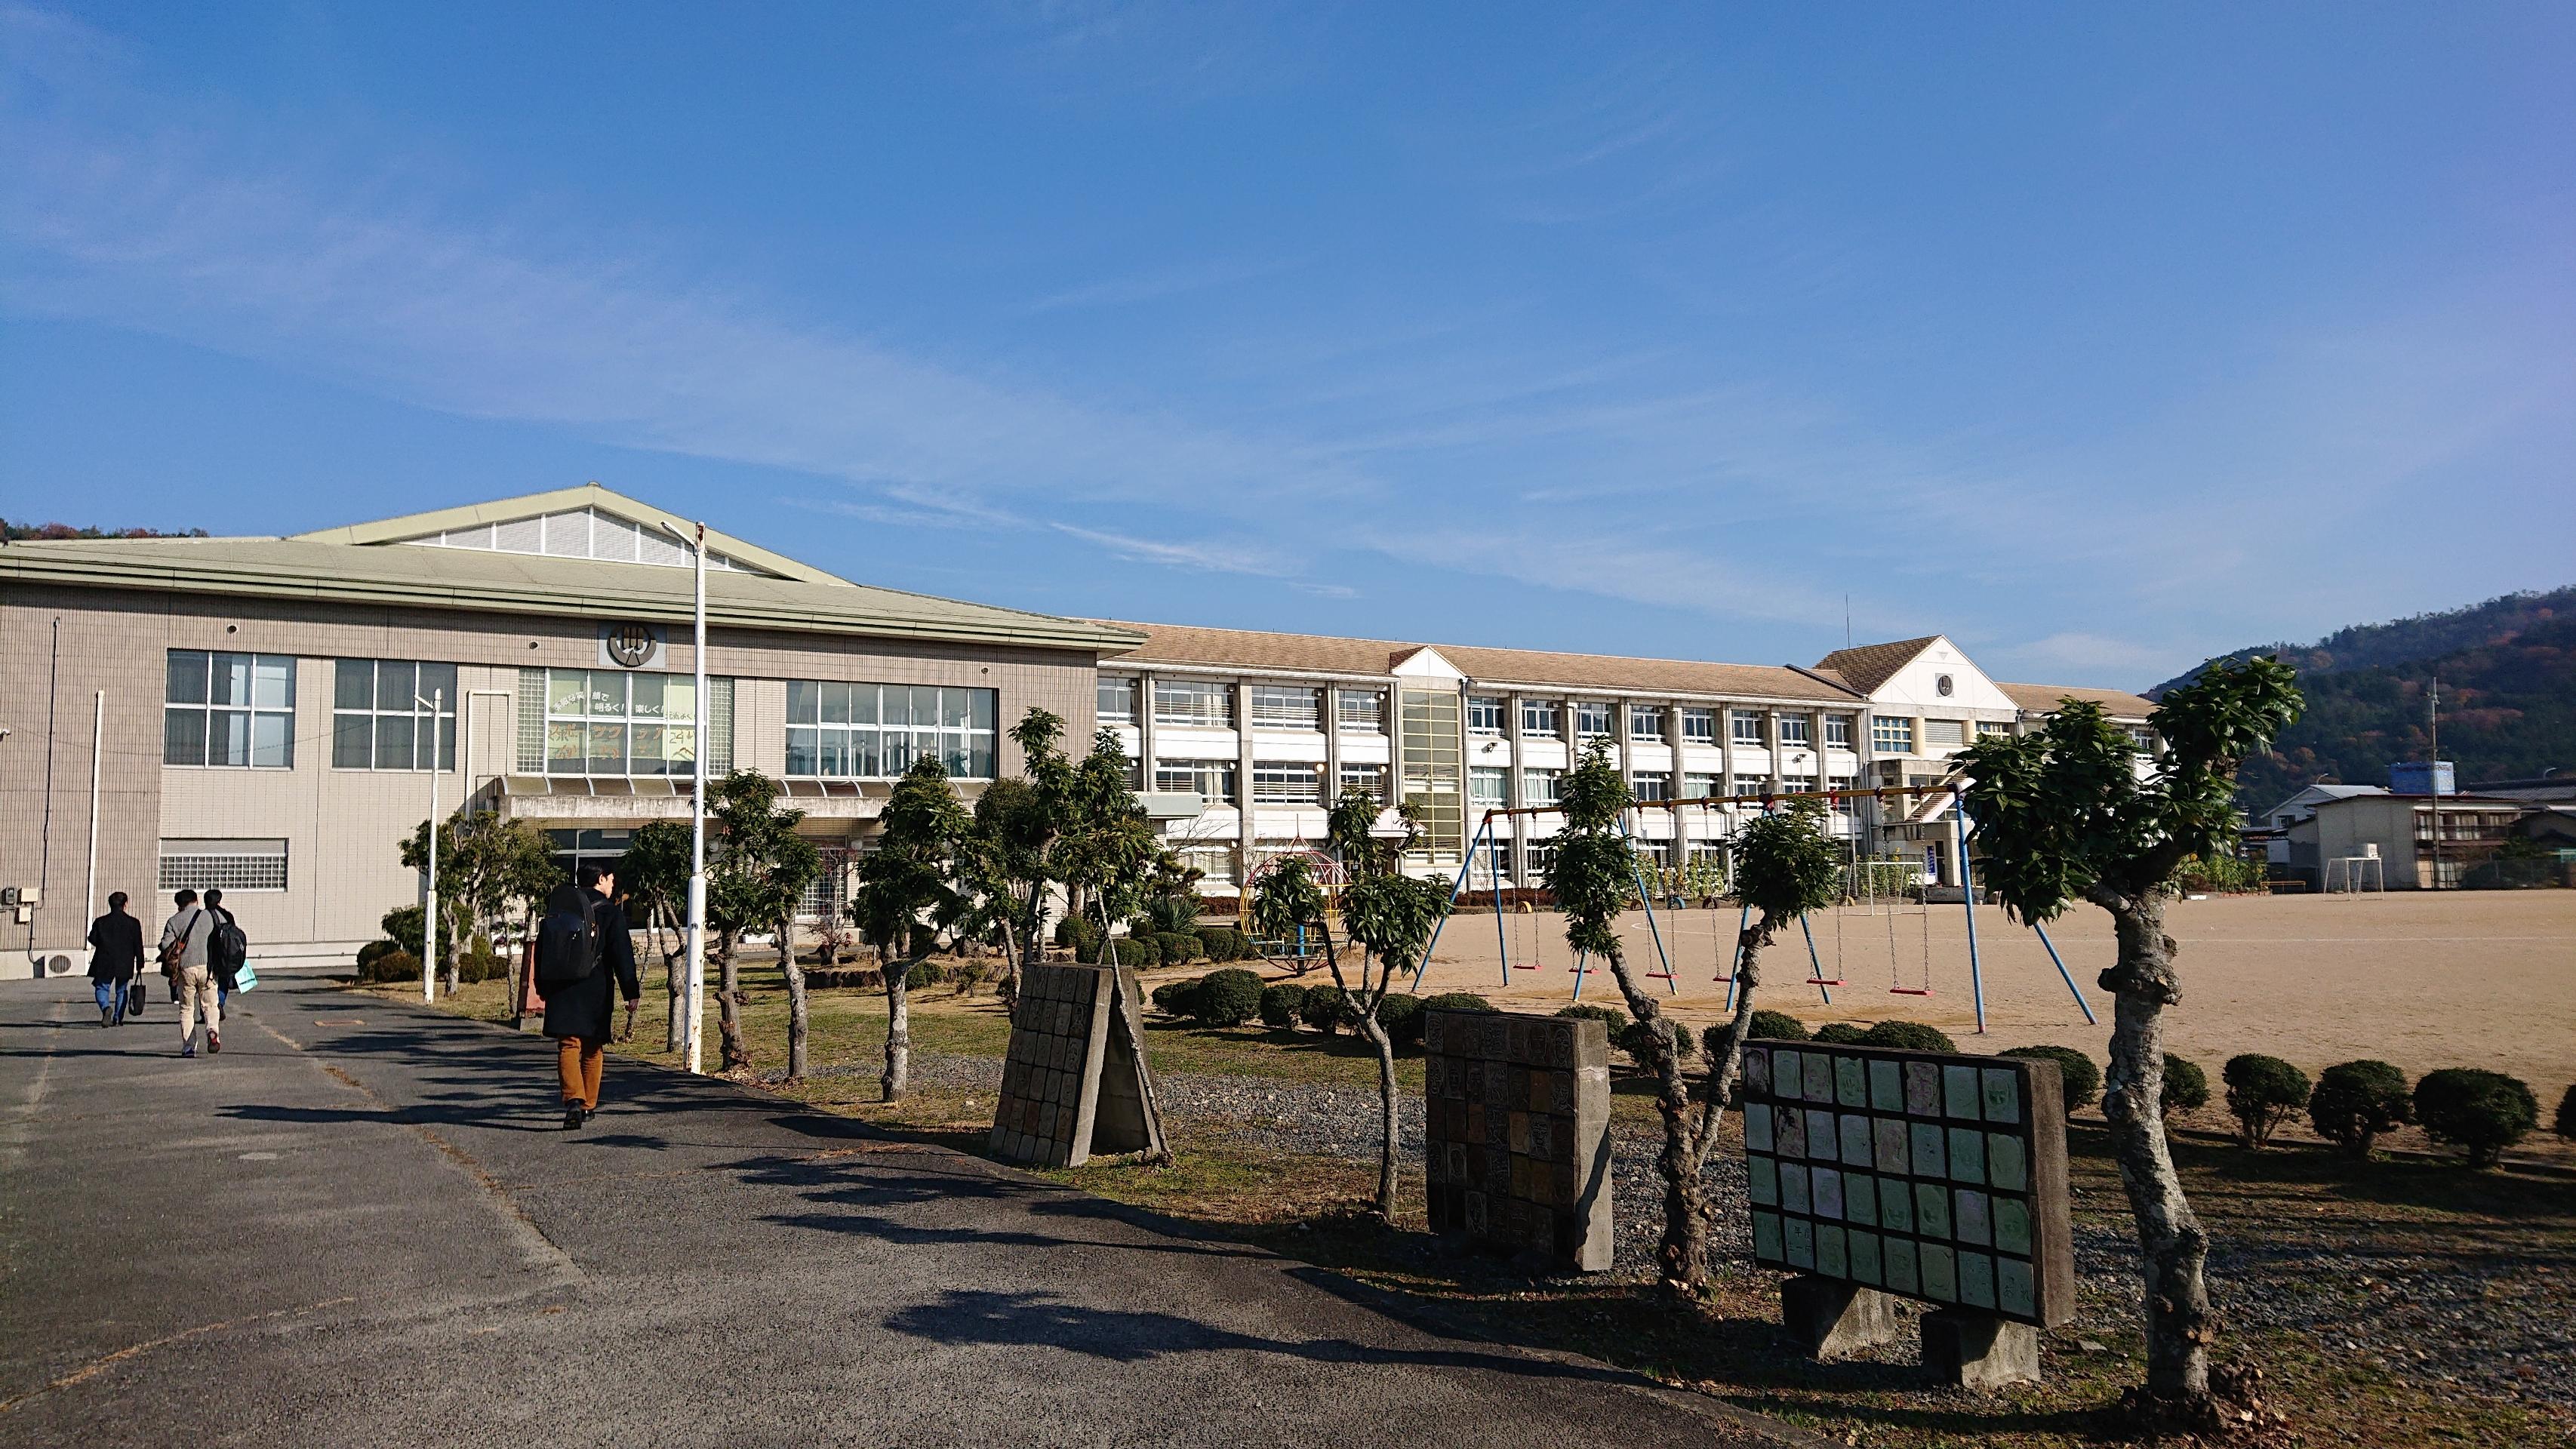 TKWO文化庁巡回公演@市川町立川辺小学校♪ : 笛吹きの雑記帳